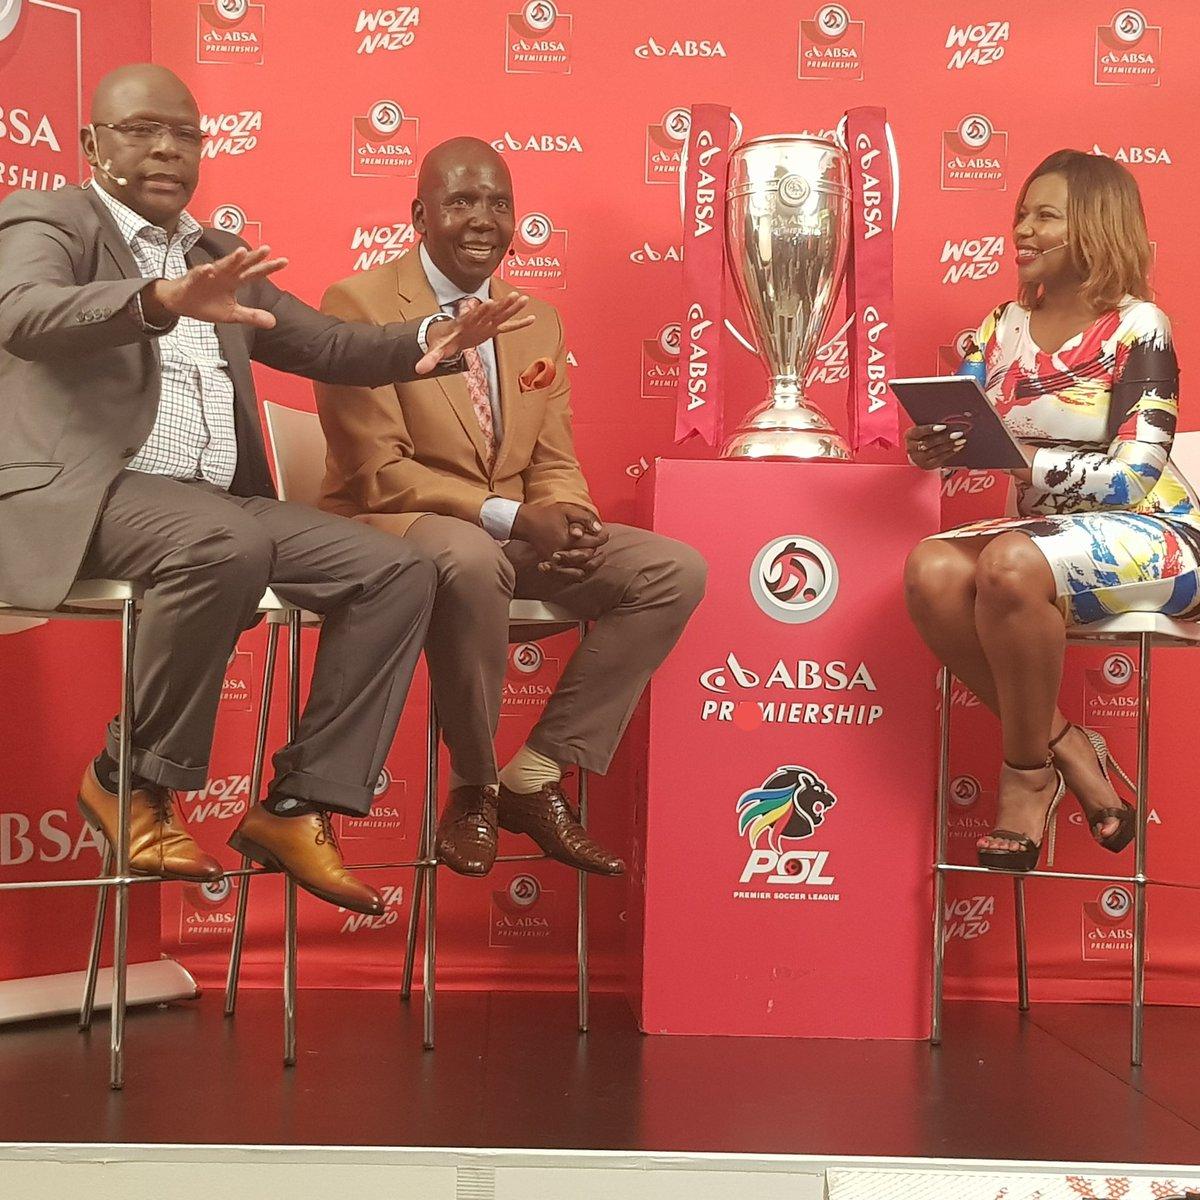 I am LIVE on Supersport 4 tonight with Alex Shakoane talking